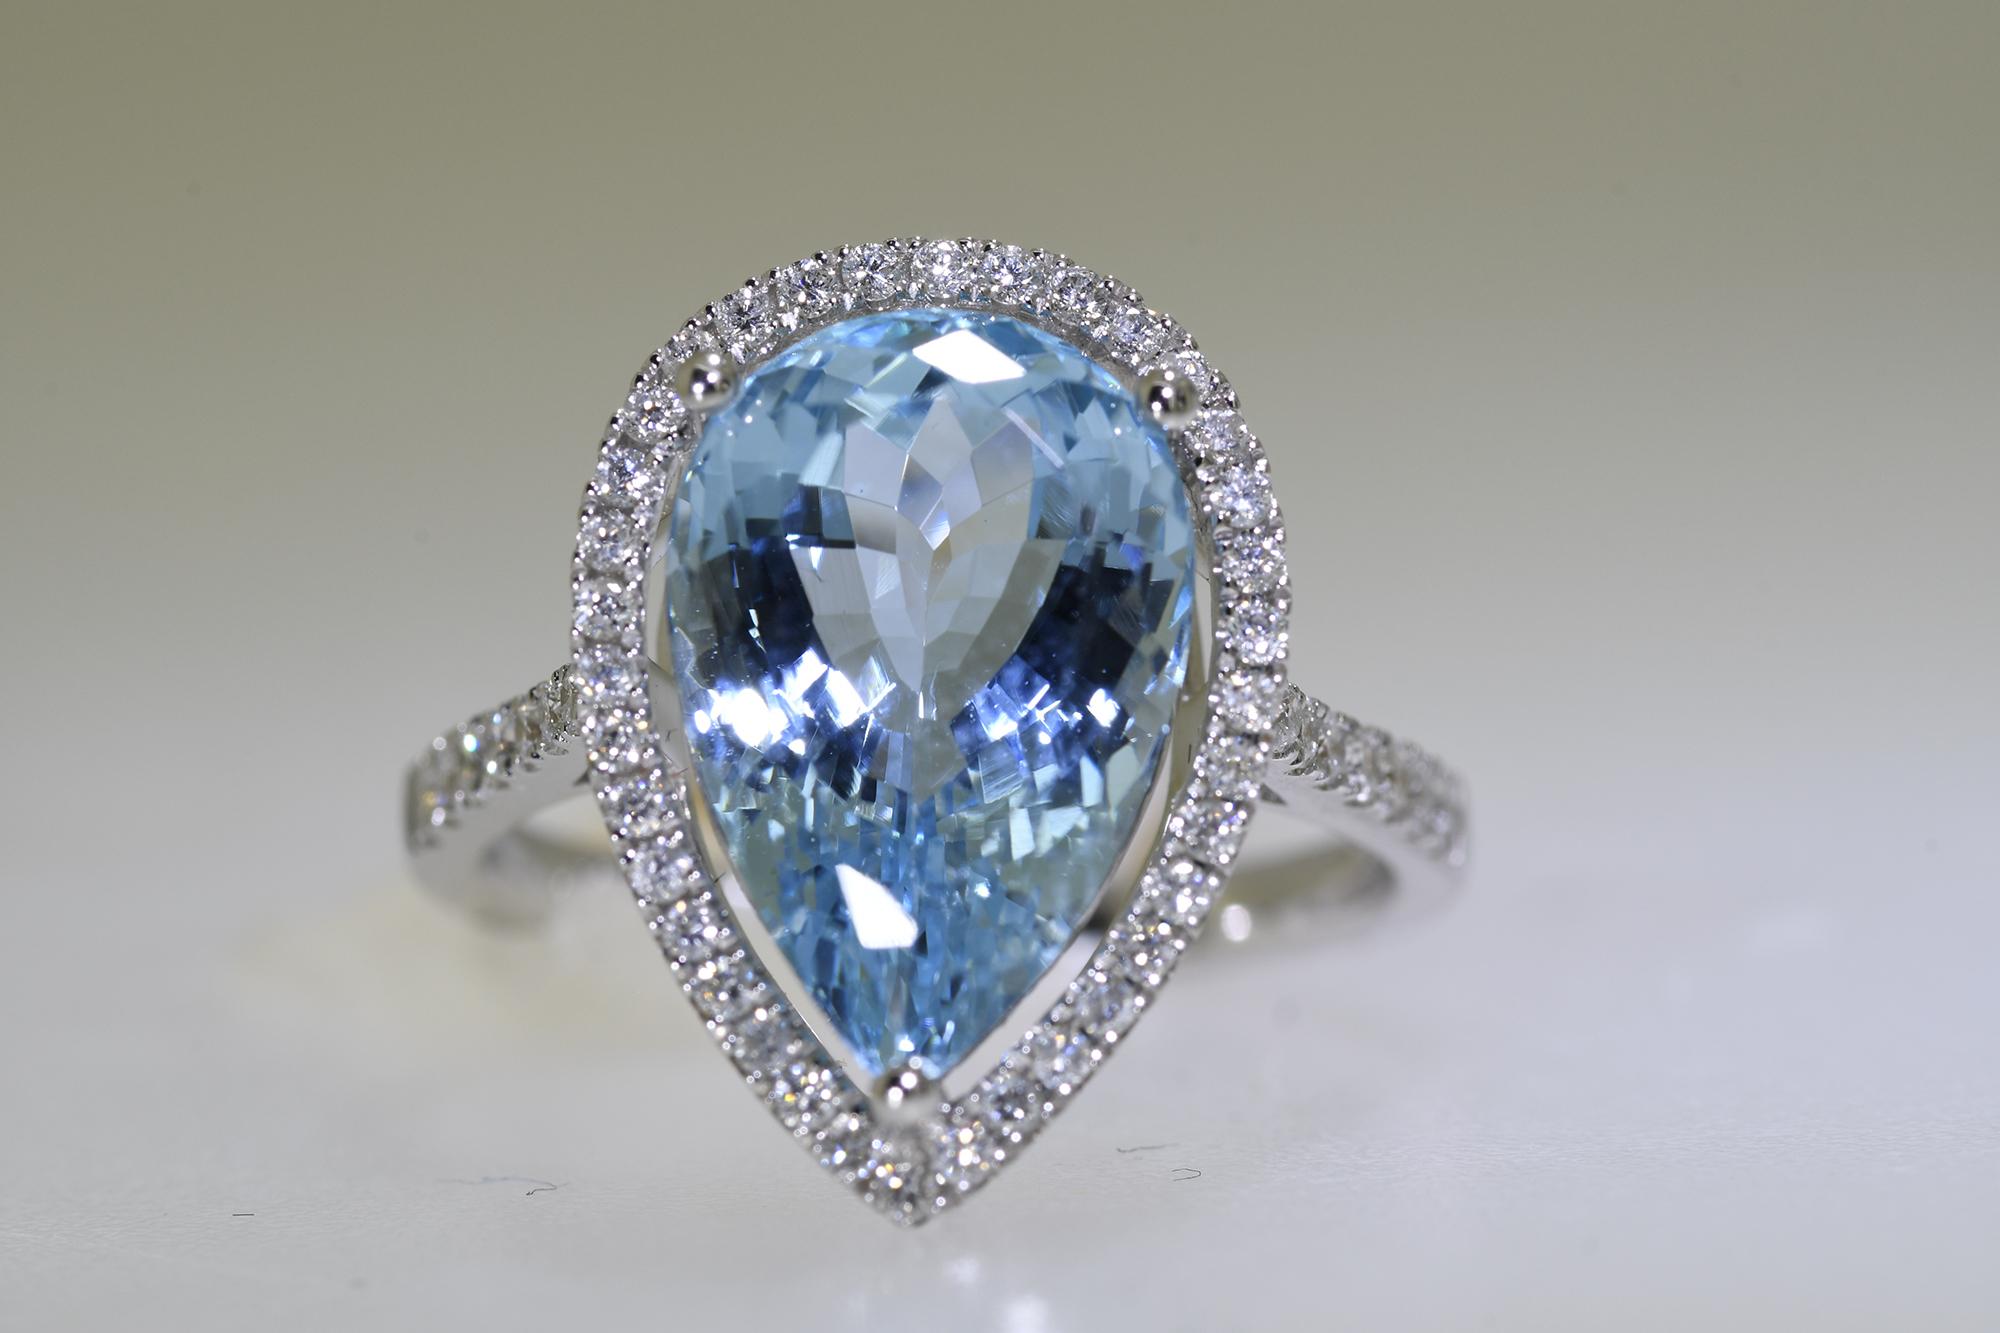 Aquamarine & Diamond Ring - Image 5 of 5